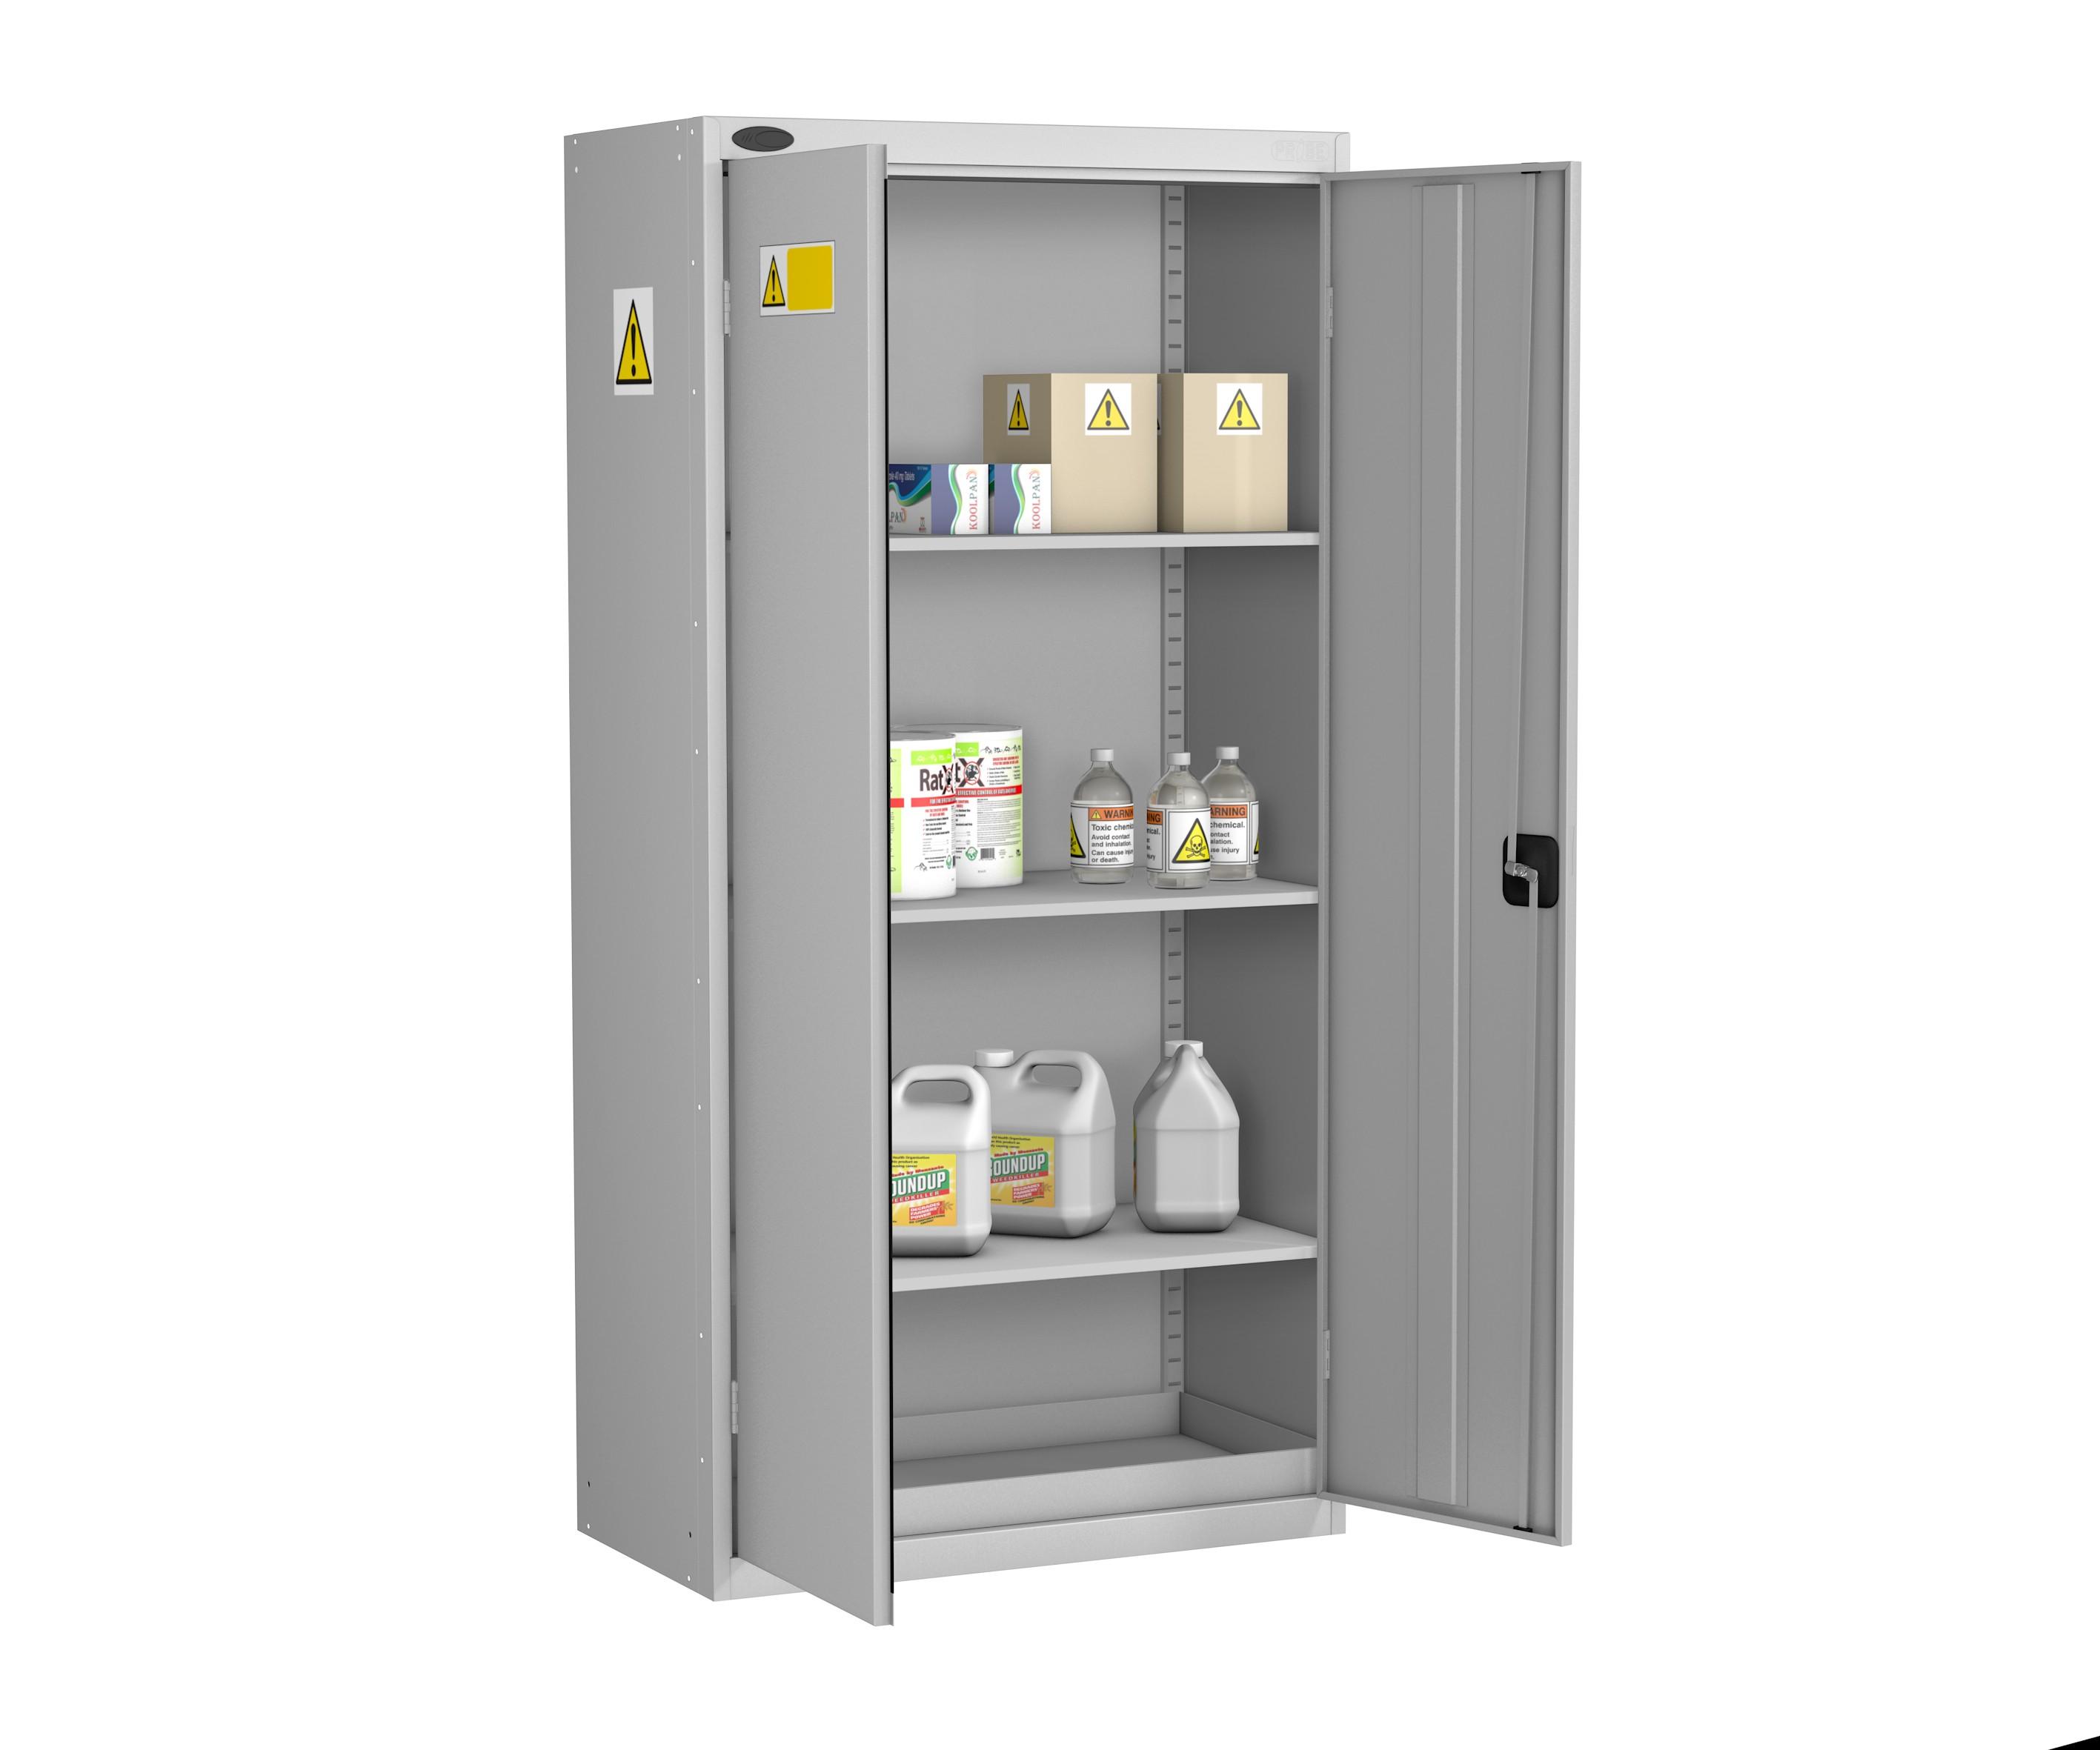 Standard COSHH Cabinet